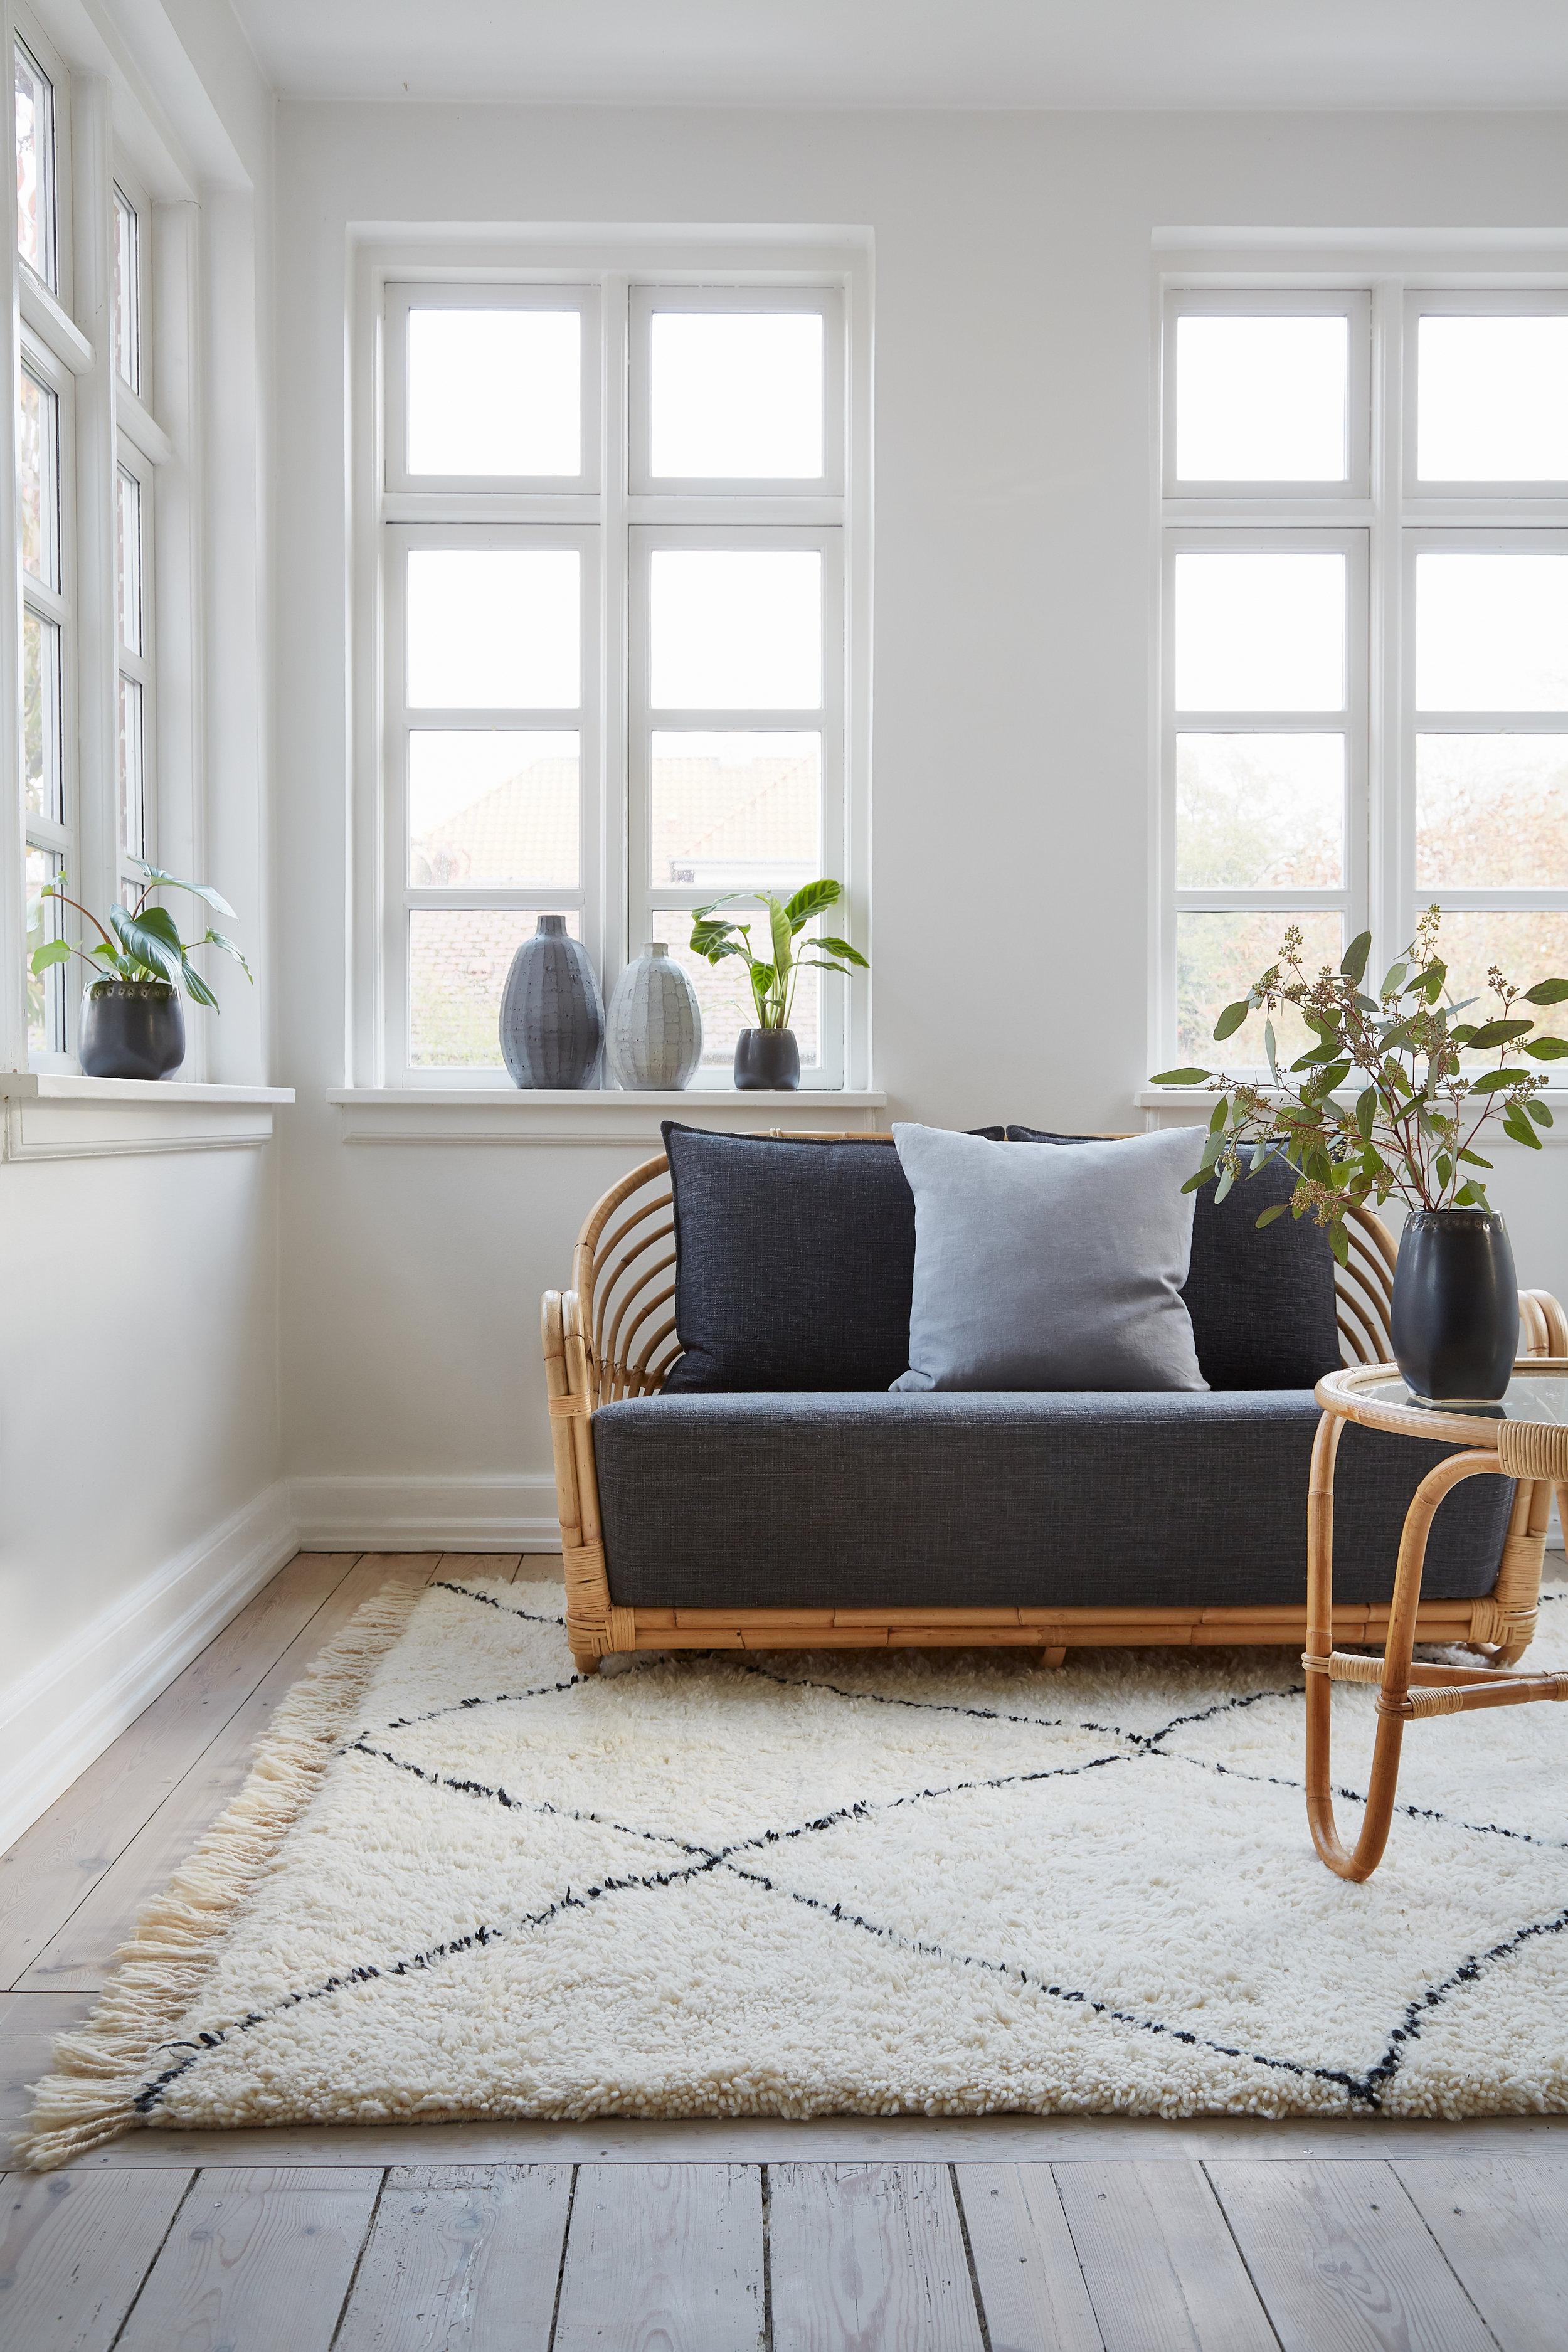 Charlottenborg 2-Seater/ Charlottenborg table/ Moroccan carpet